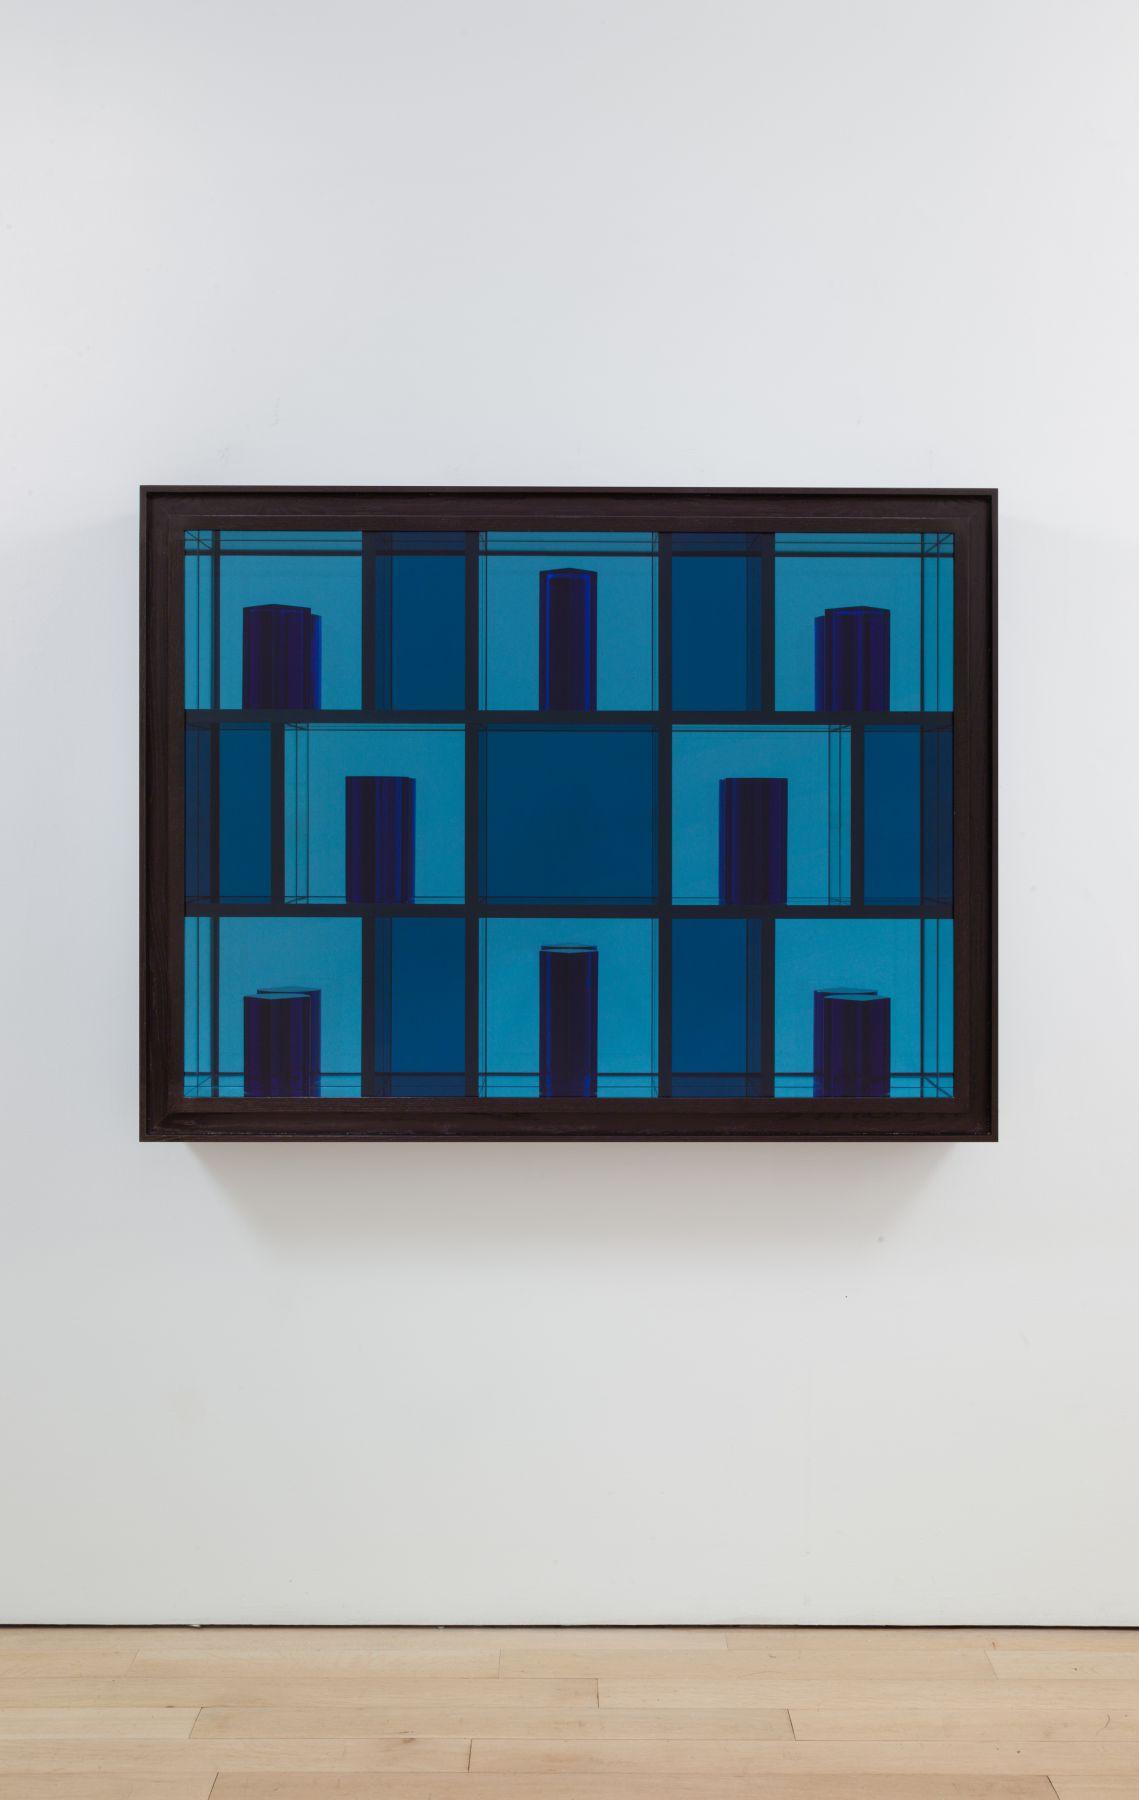 JOSIAH McELHENY Spatial Prism Painting I